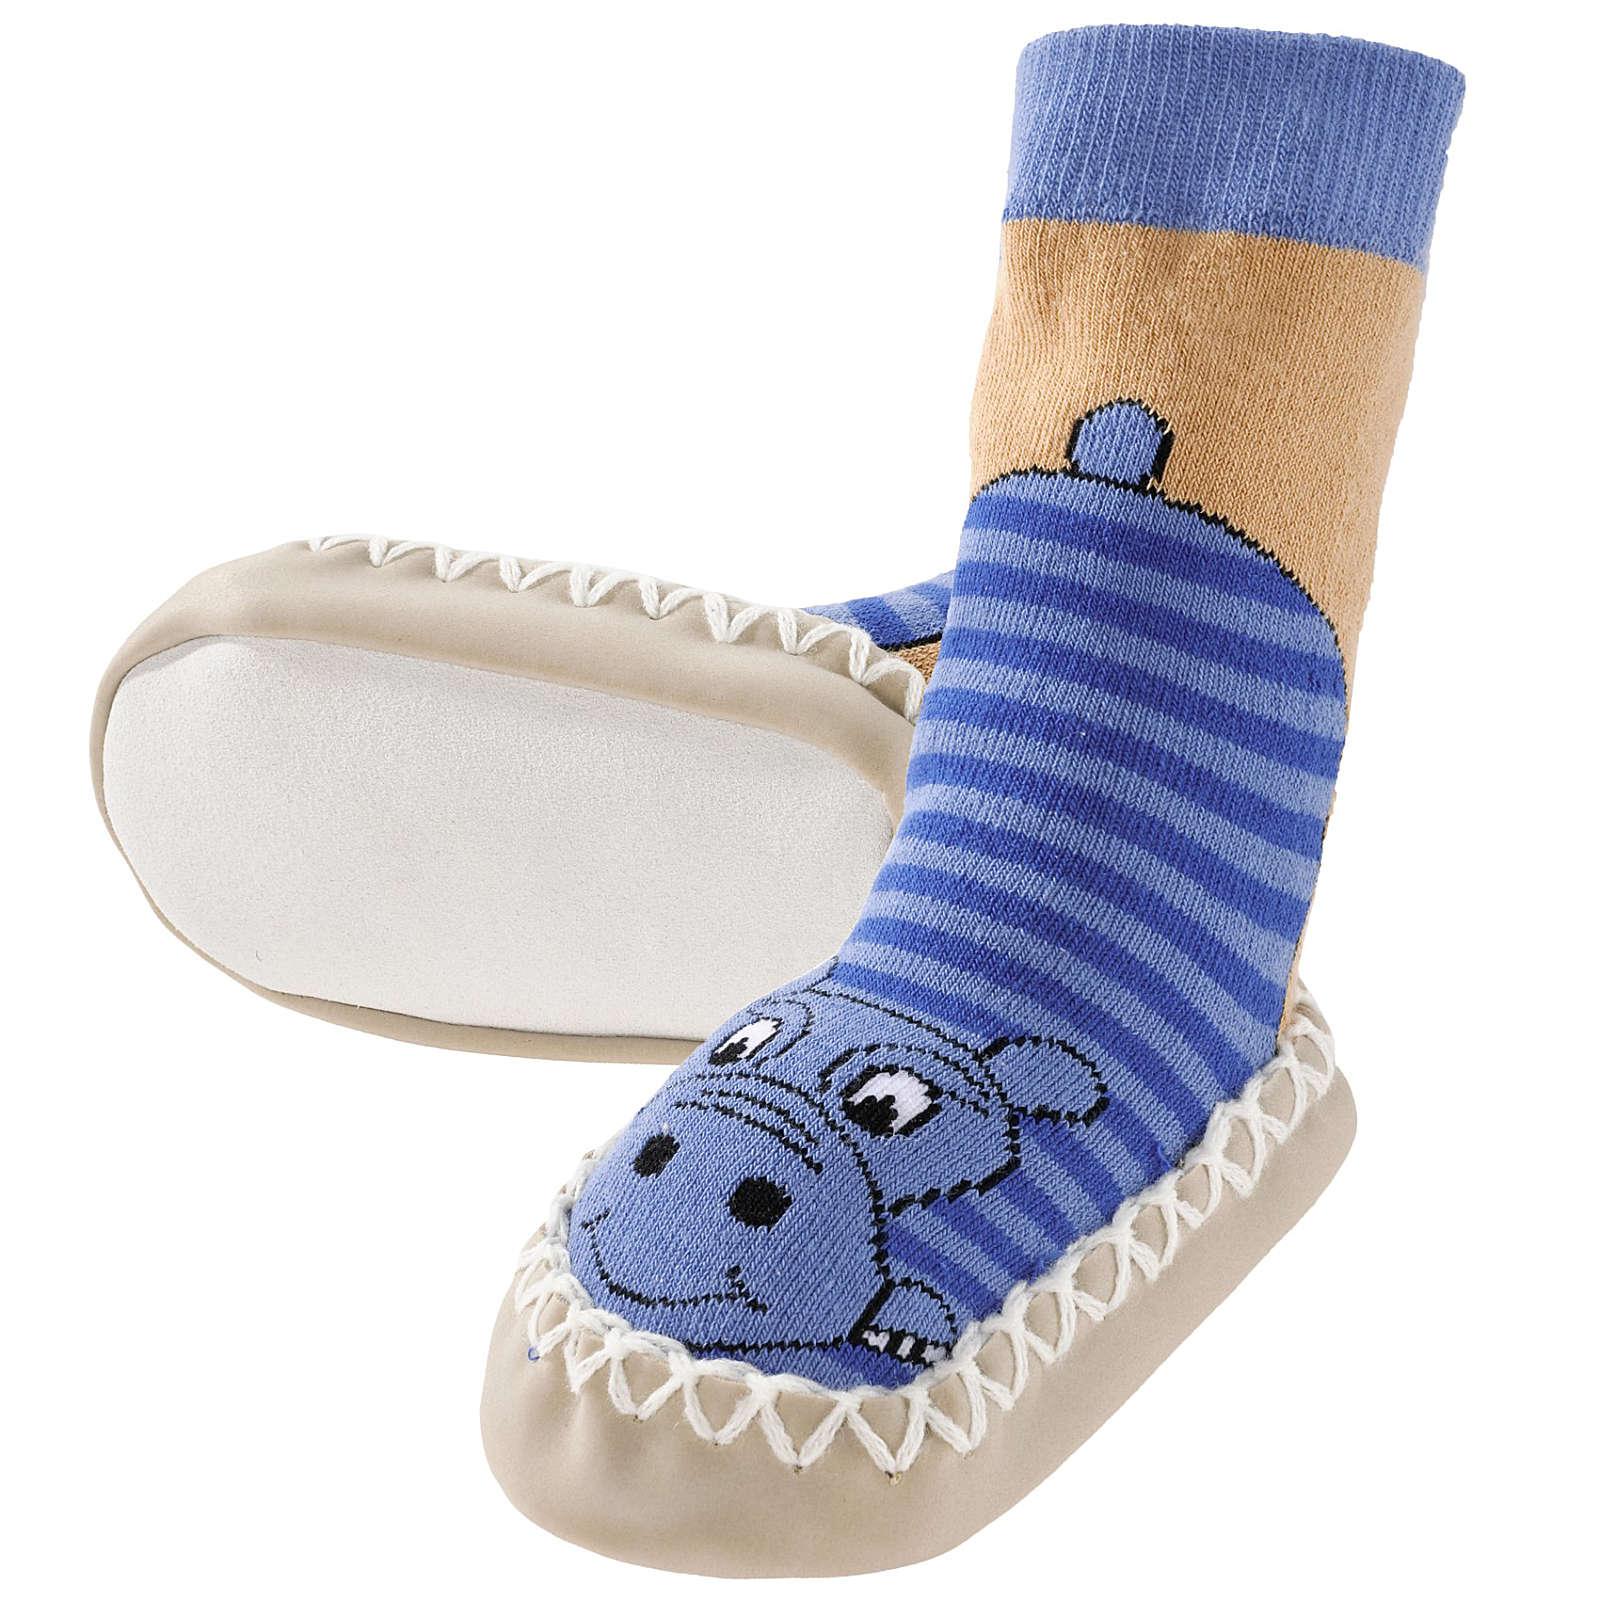 Playshoes Kinder Hausschuhe Nilpferd blau Junge Gr. 17/18